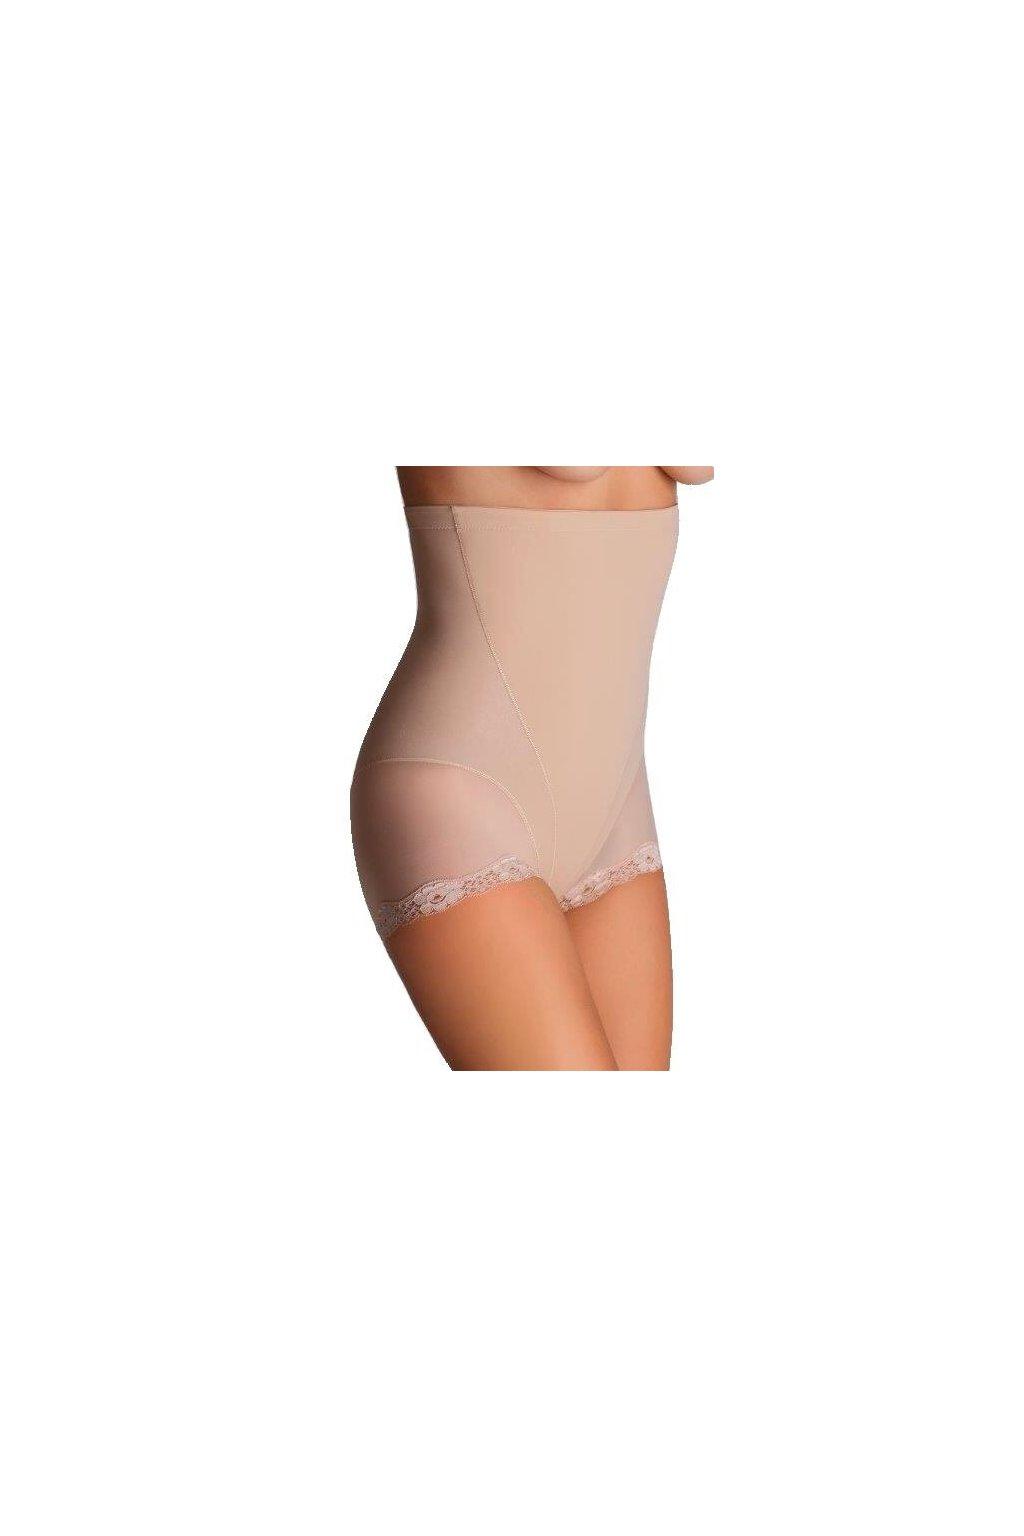 Stahovací kalhotky s krajkou Violetta béžové